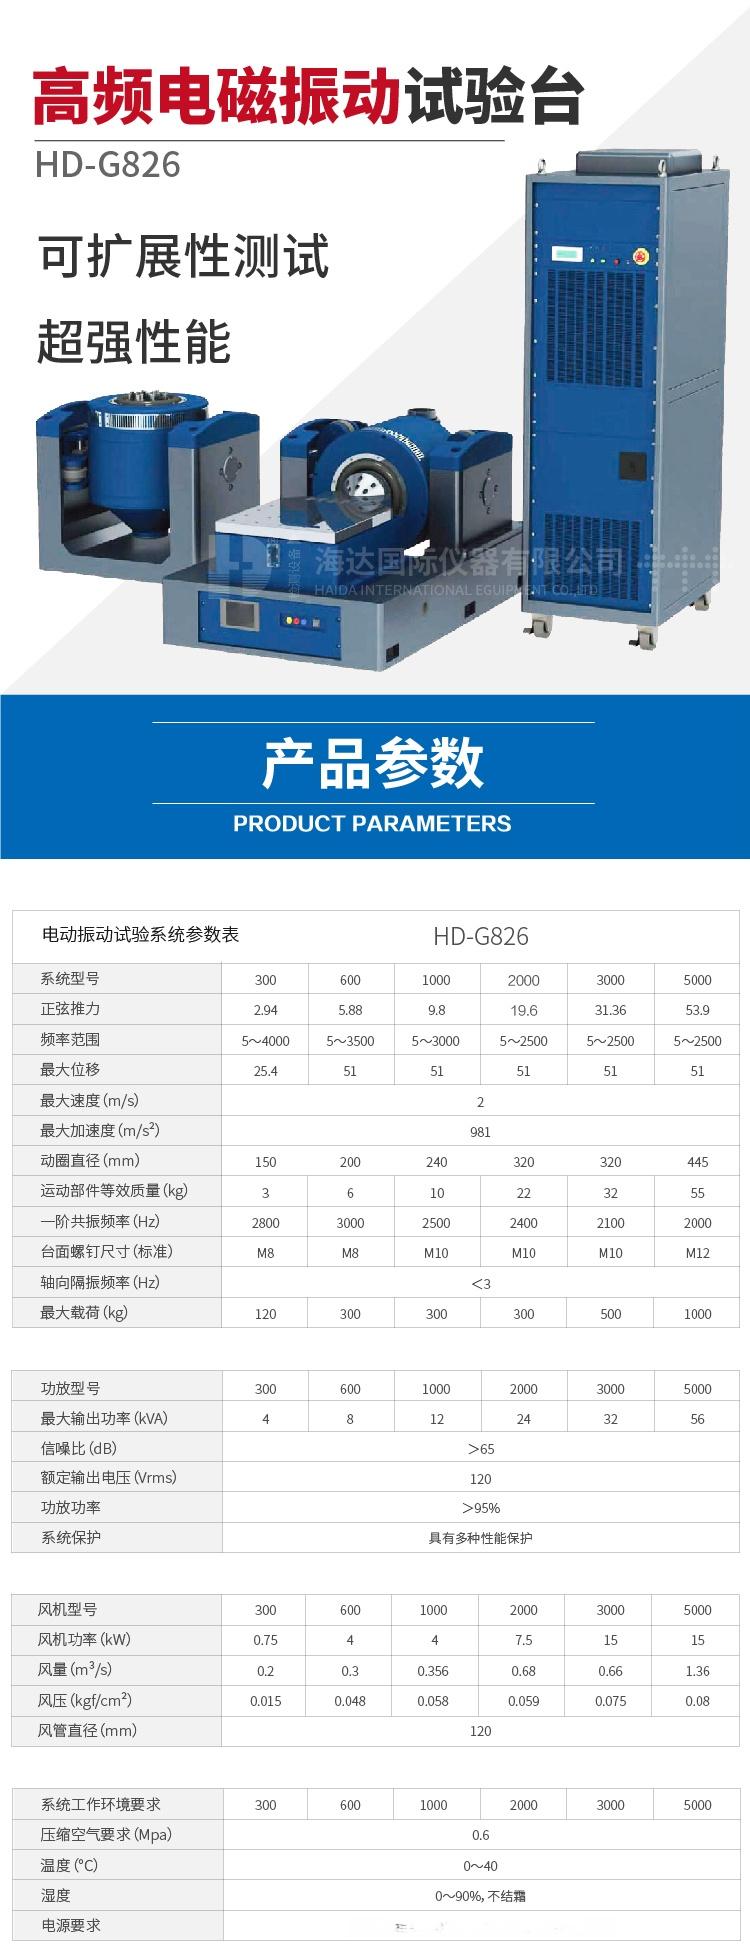 HD-G826電動振動系統-05.jpg